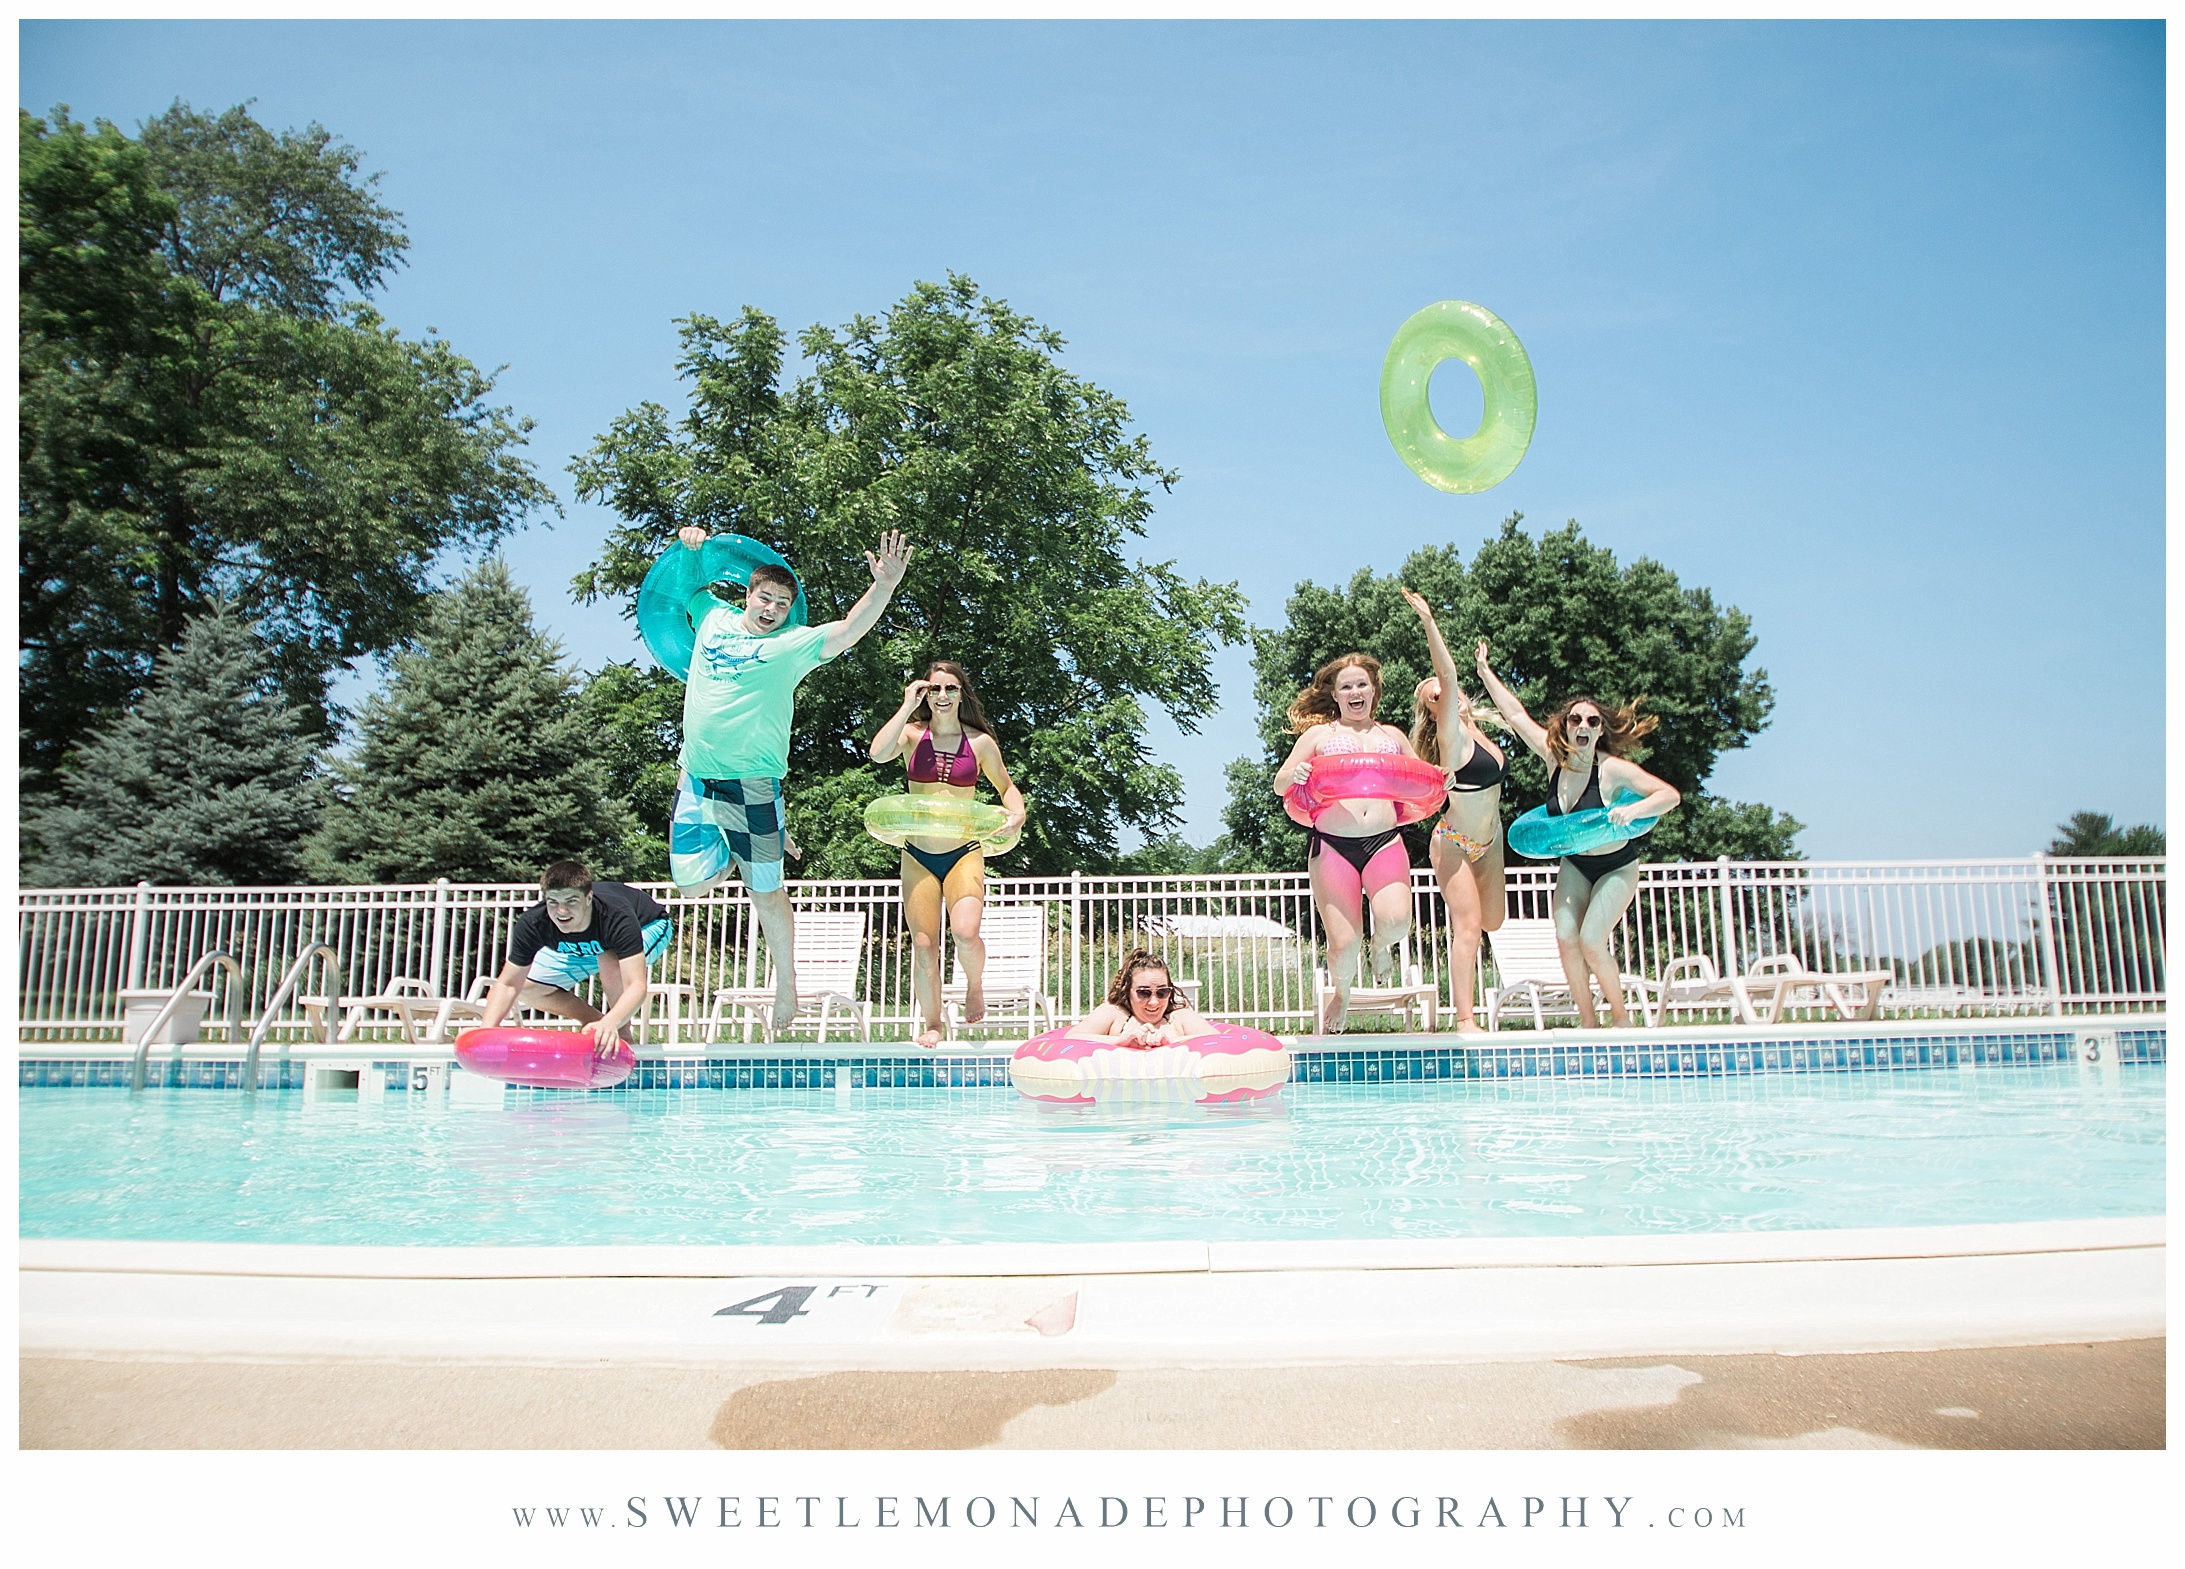 champaign-senior-photographer-sweet-lemonade-photography-senior-pictures-pool_2168.jpg